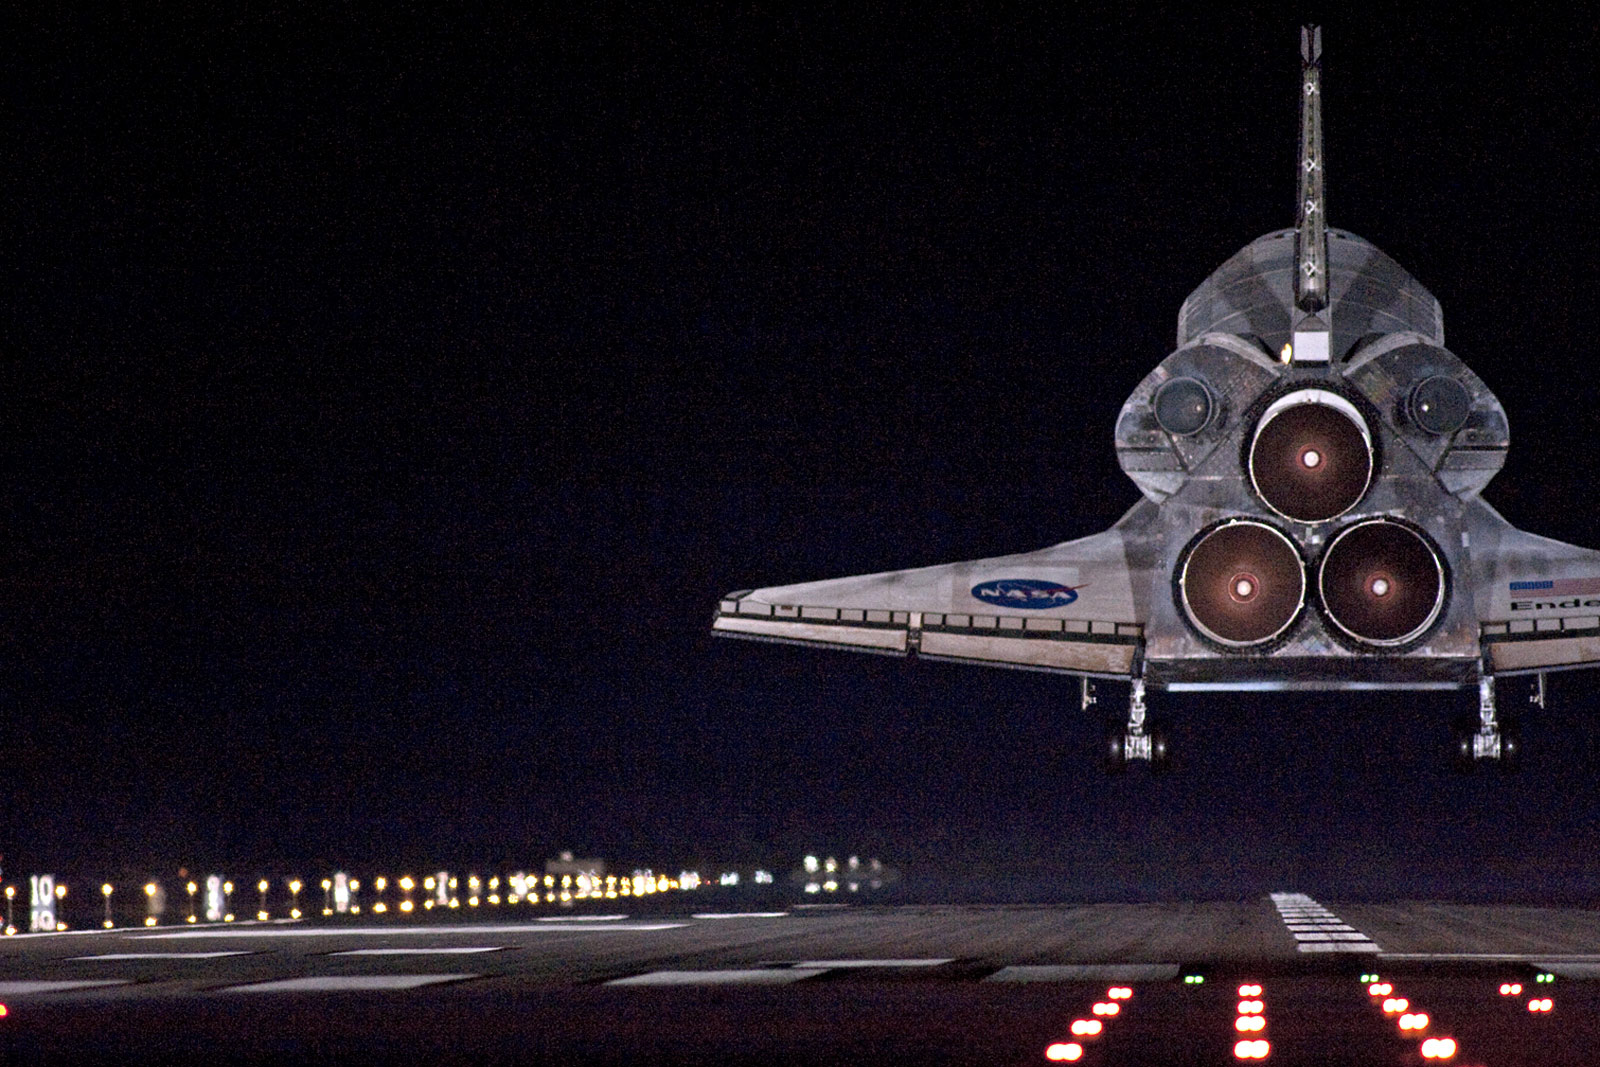 space shuttle landing trainer - photo #1